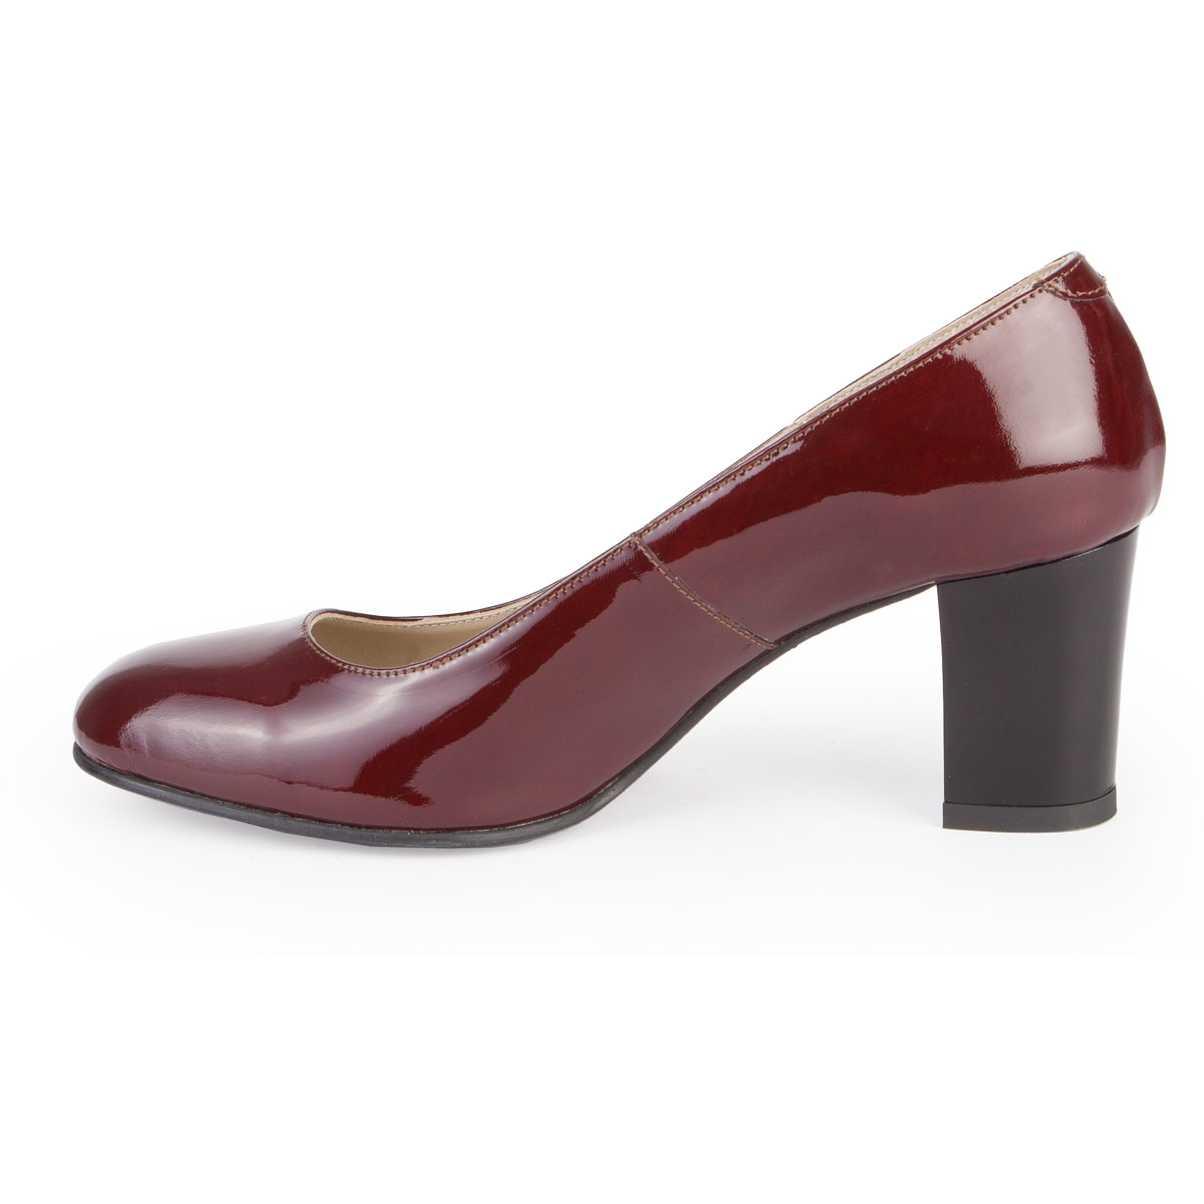 Pantofi bordo din piele lacuita P105